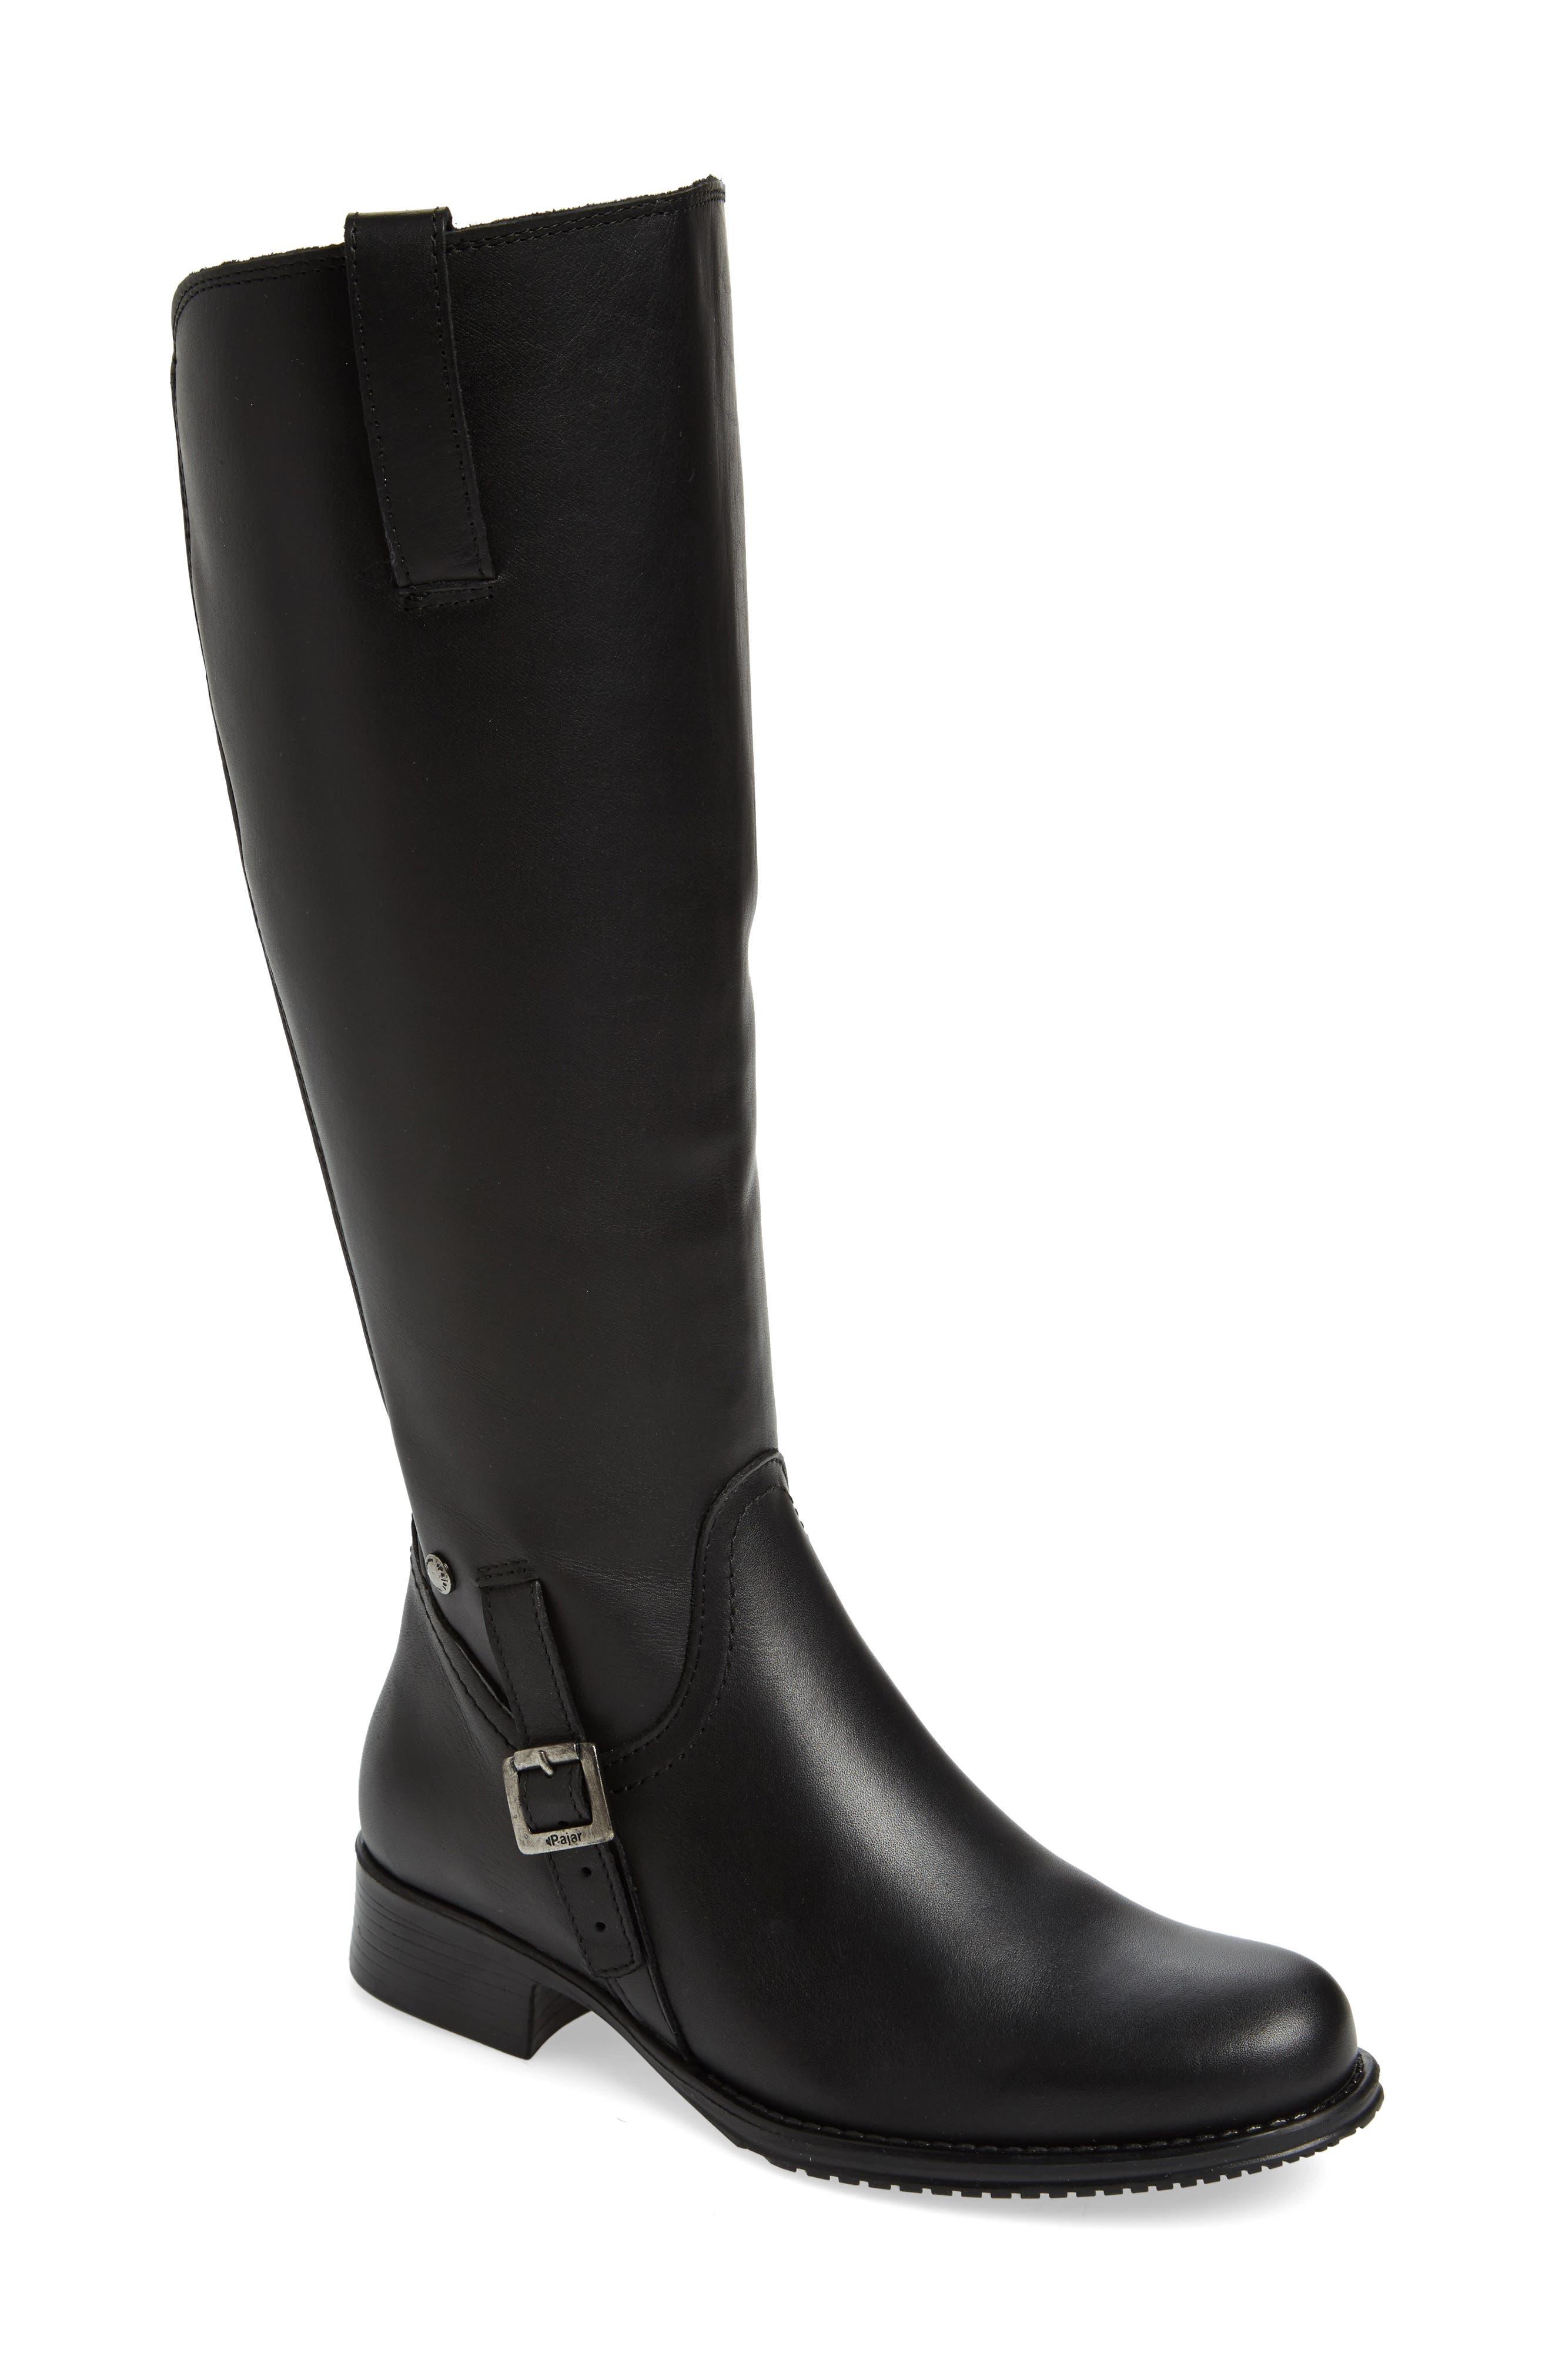 Alternate Image 1 Selected - Pajar Dogueno Waterproof Boot (Women)